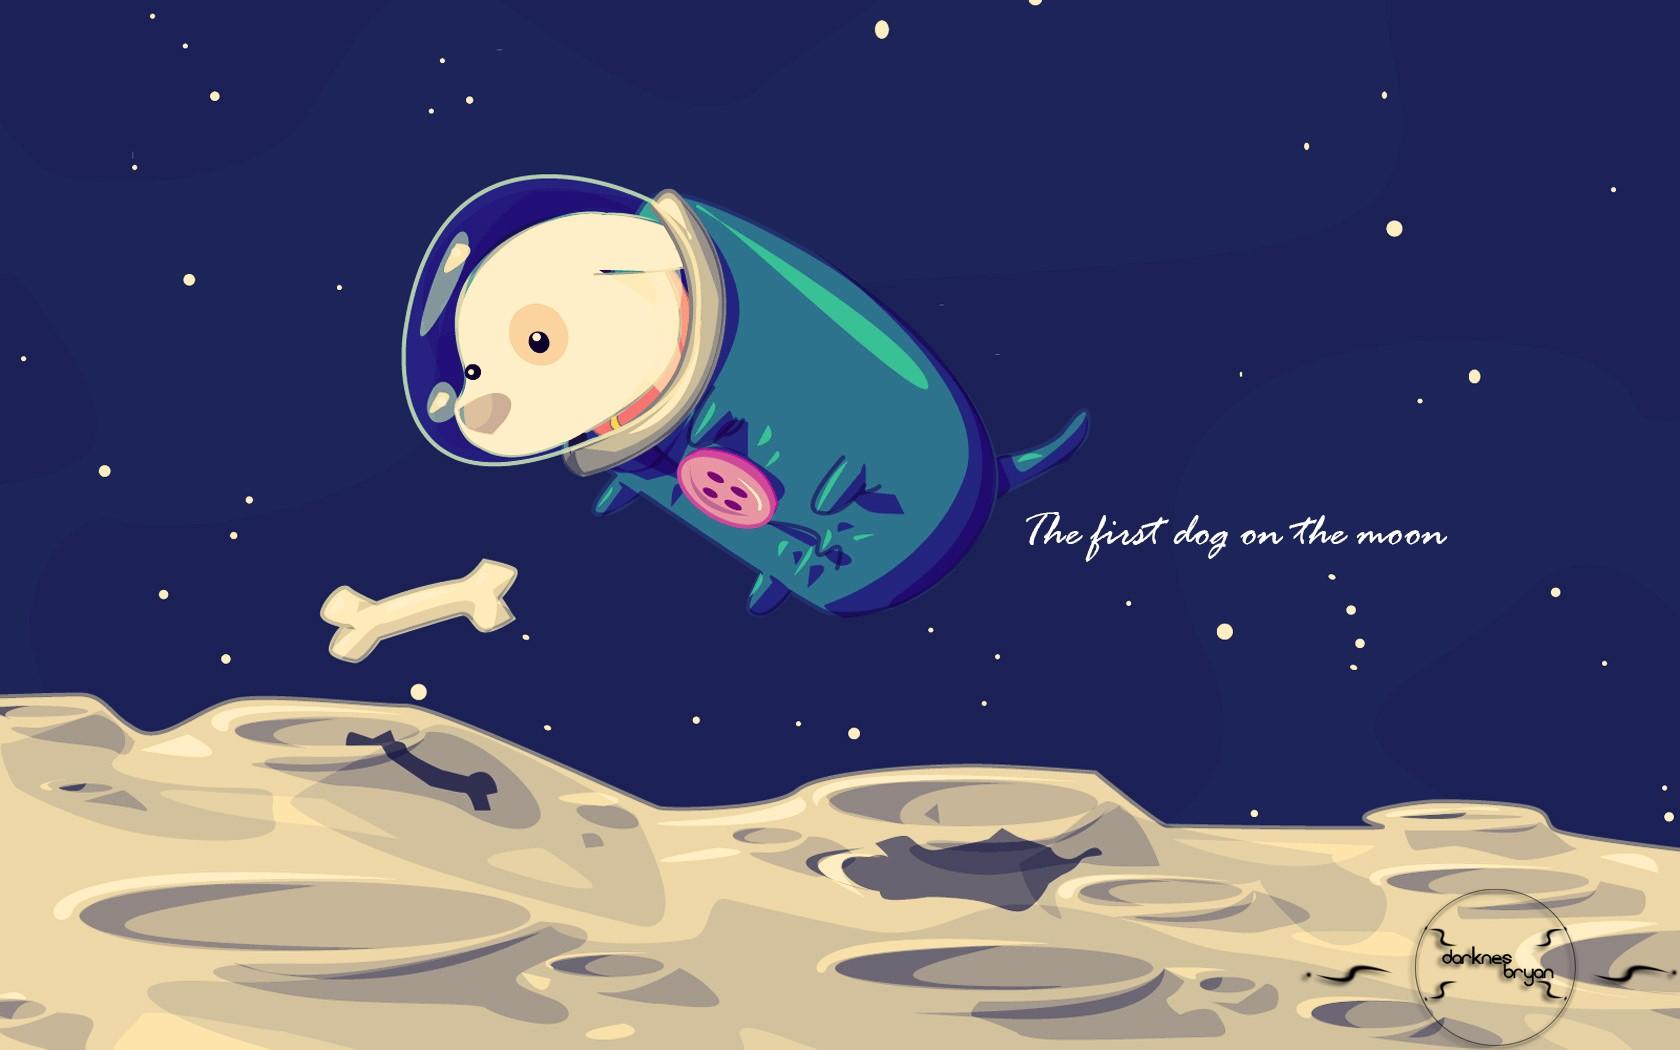 Wallpaper - Dog In Space Cartoon - HD Wallpaper